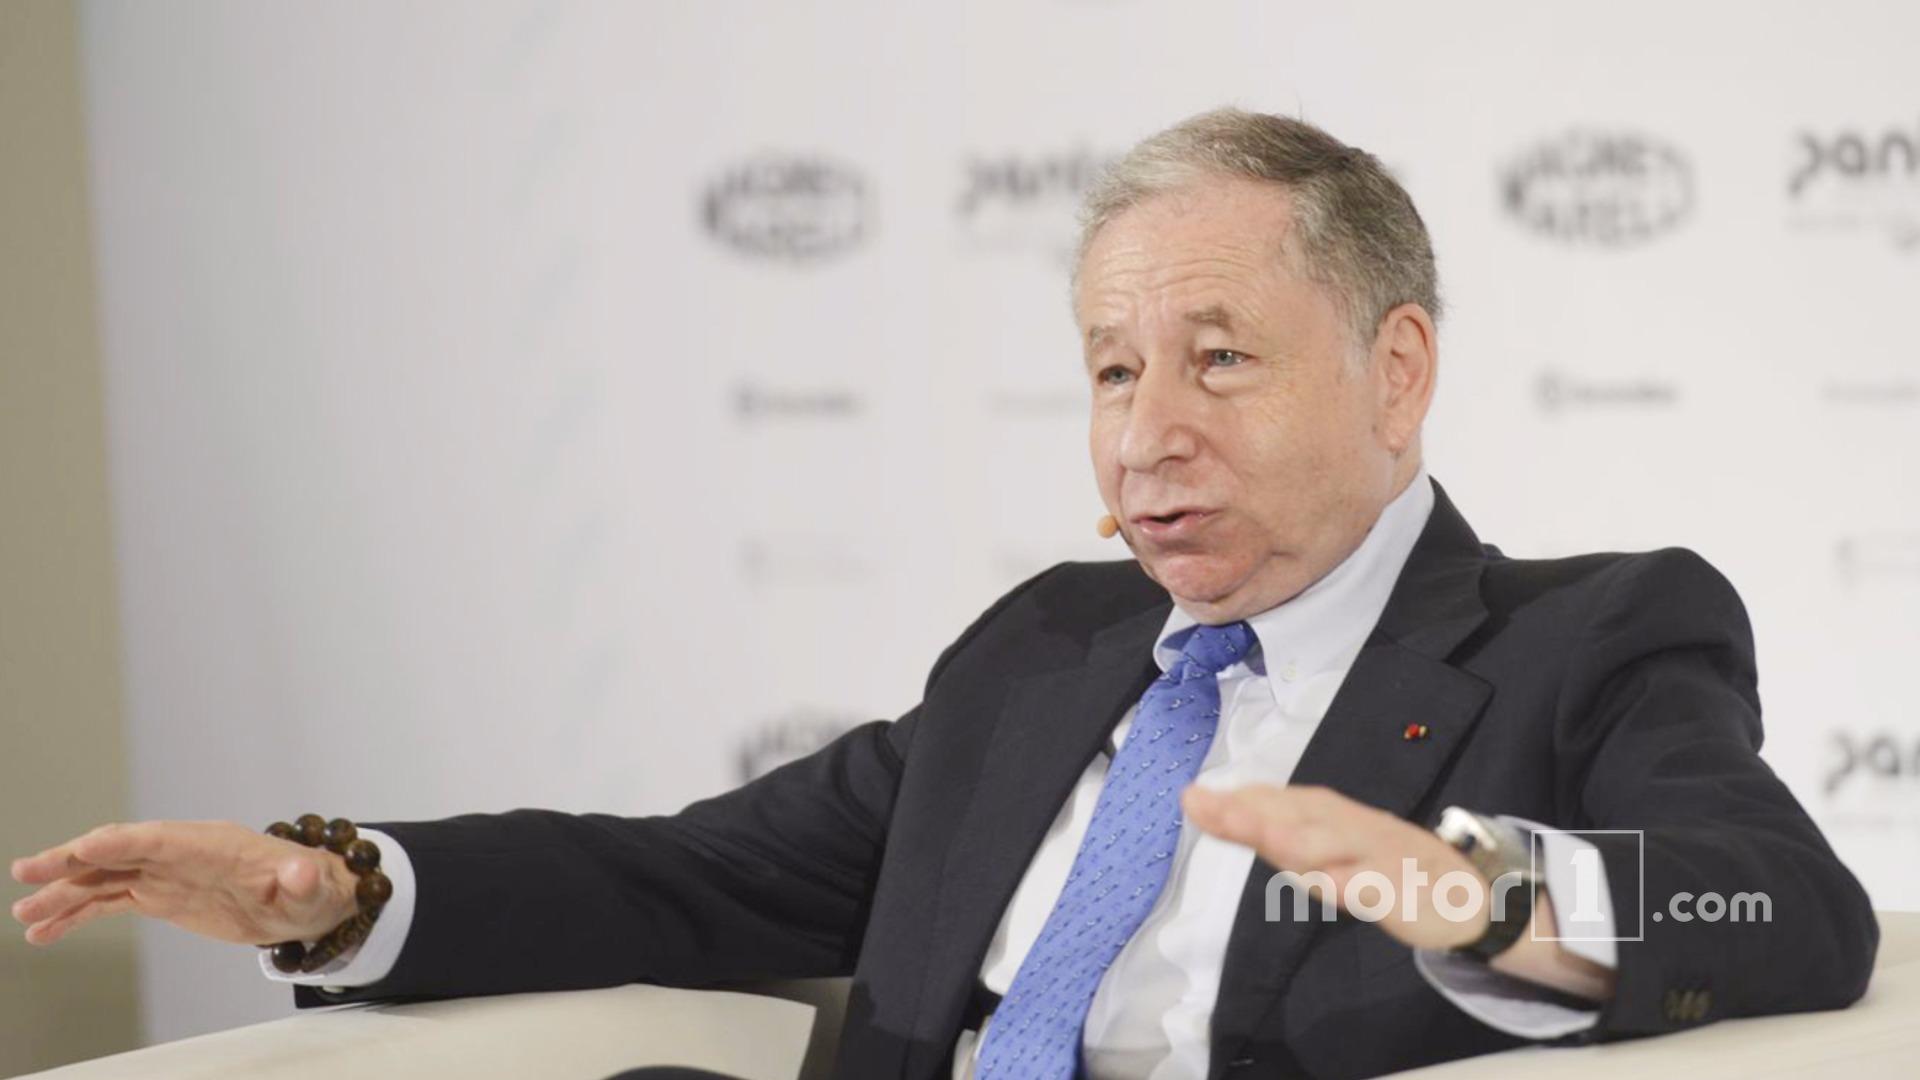 Todt: F1 revolution averted but key challenges remain